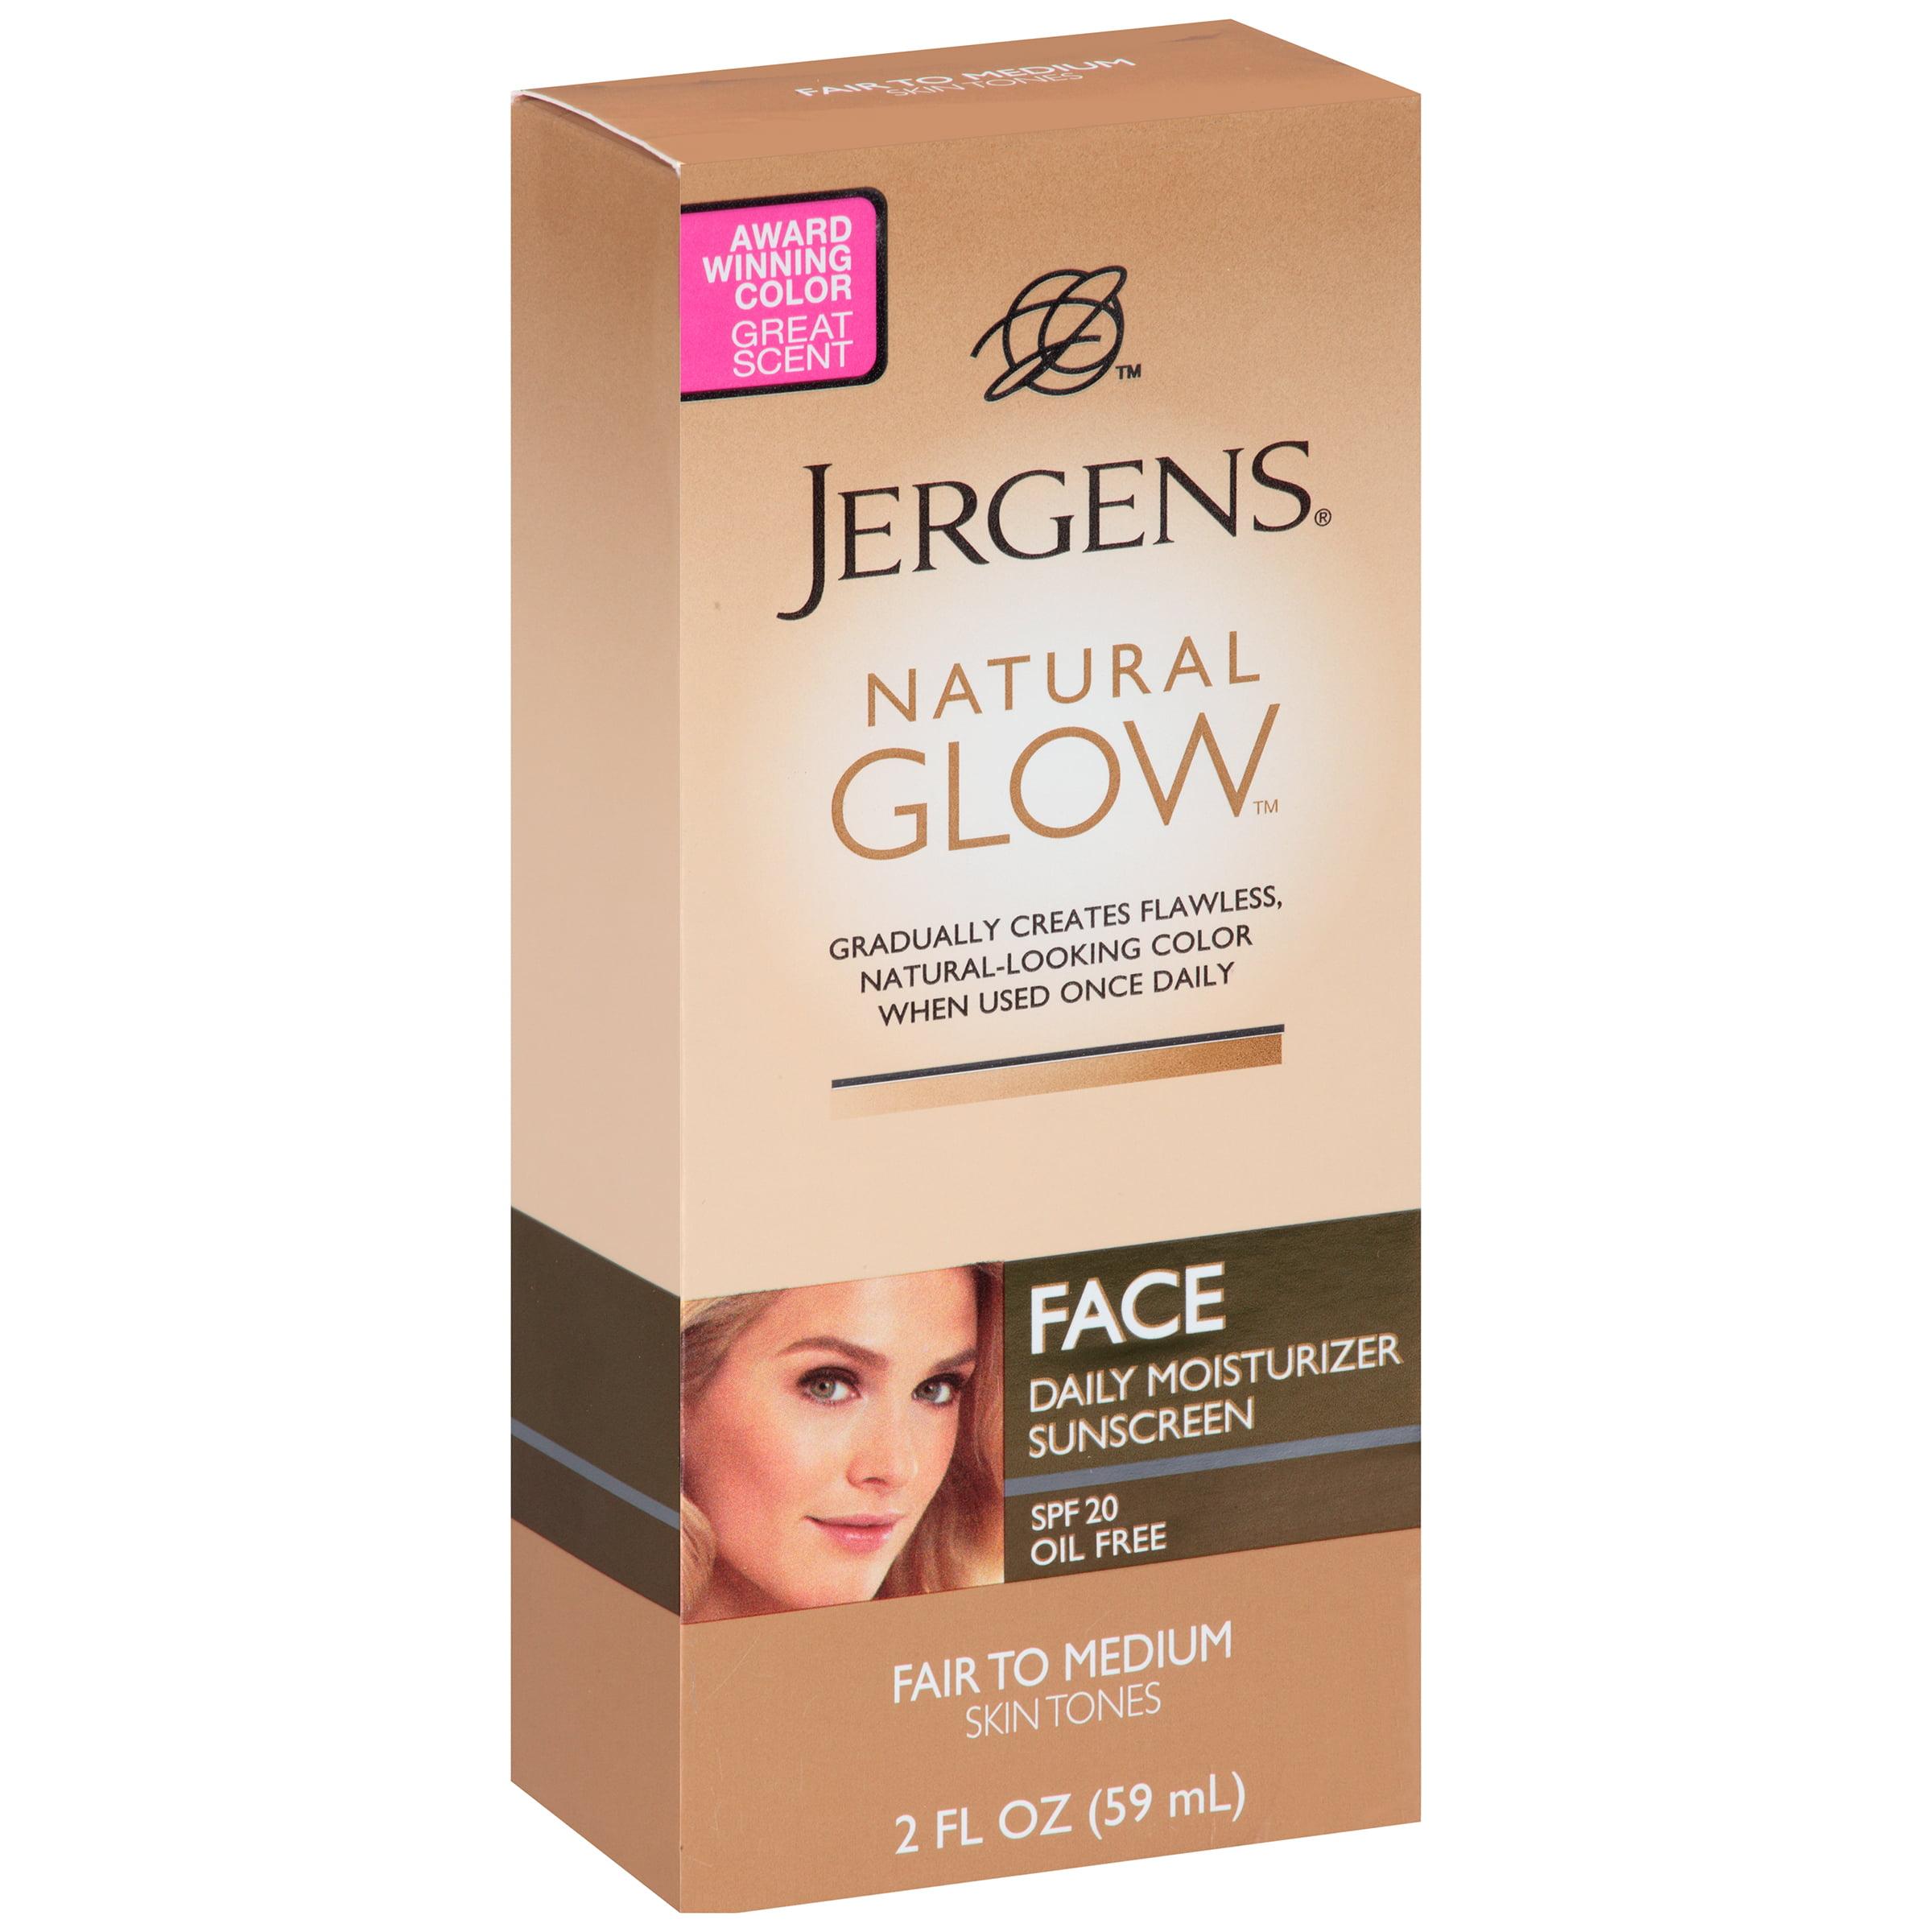 Jergens Face Daily Moisturizer Sunscreen Natural Glow SPF 20, 2.0 FL OZ